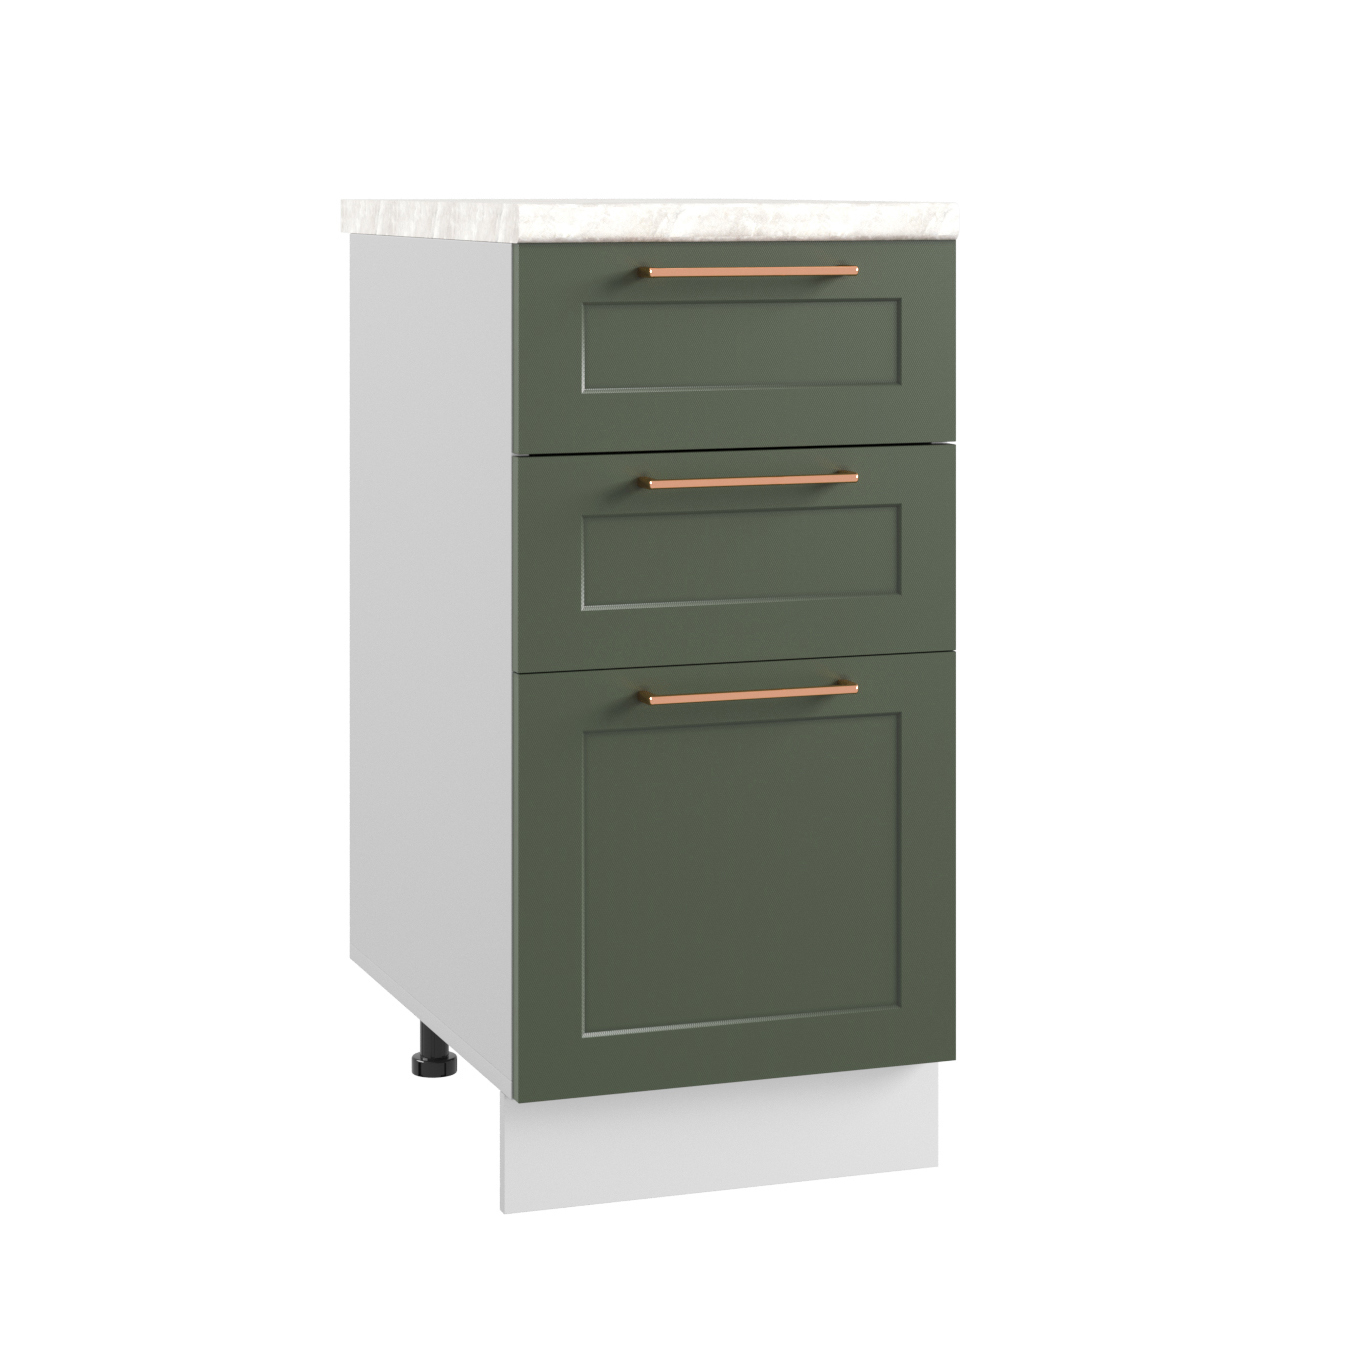 Кухня Квадро МСЯ 400 Шкаф нижний с ящиками глубина 330